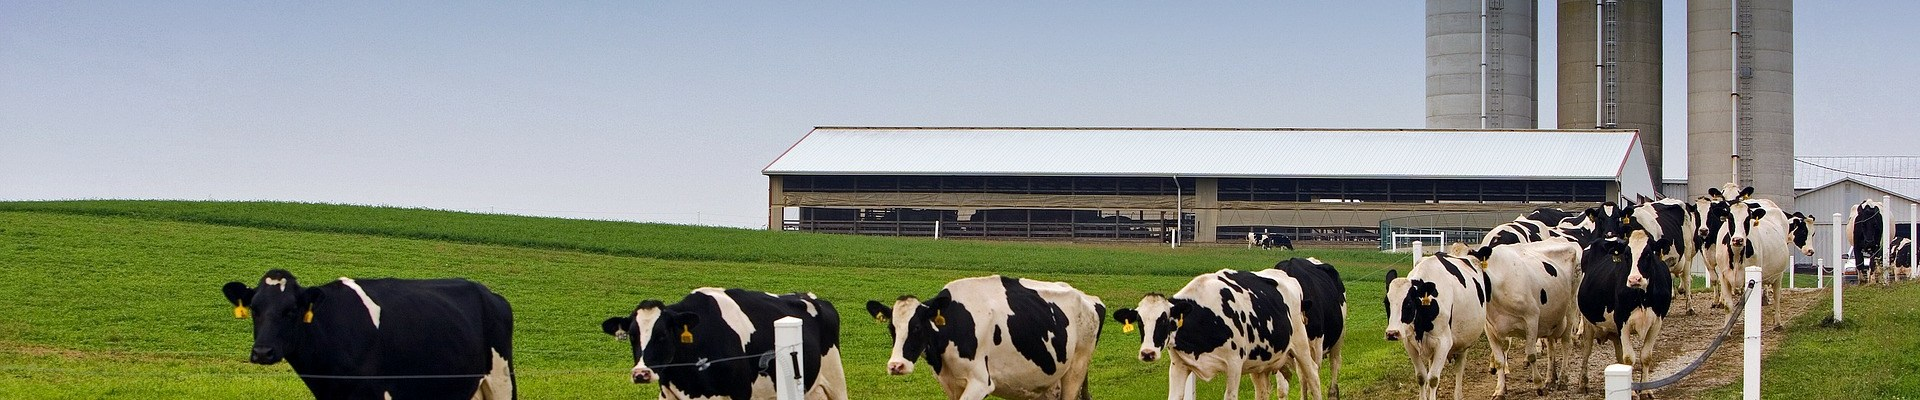 Materiales para compostar: estiércol de vaca